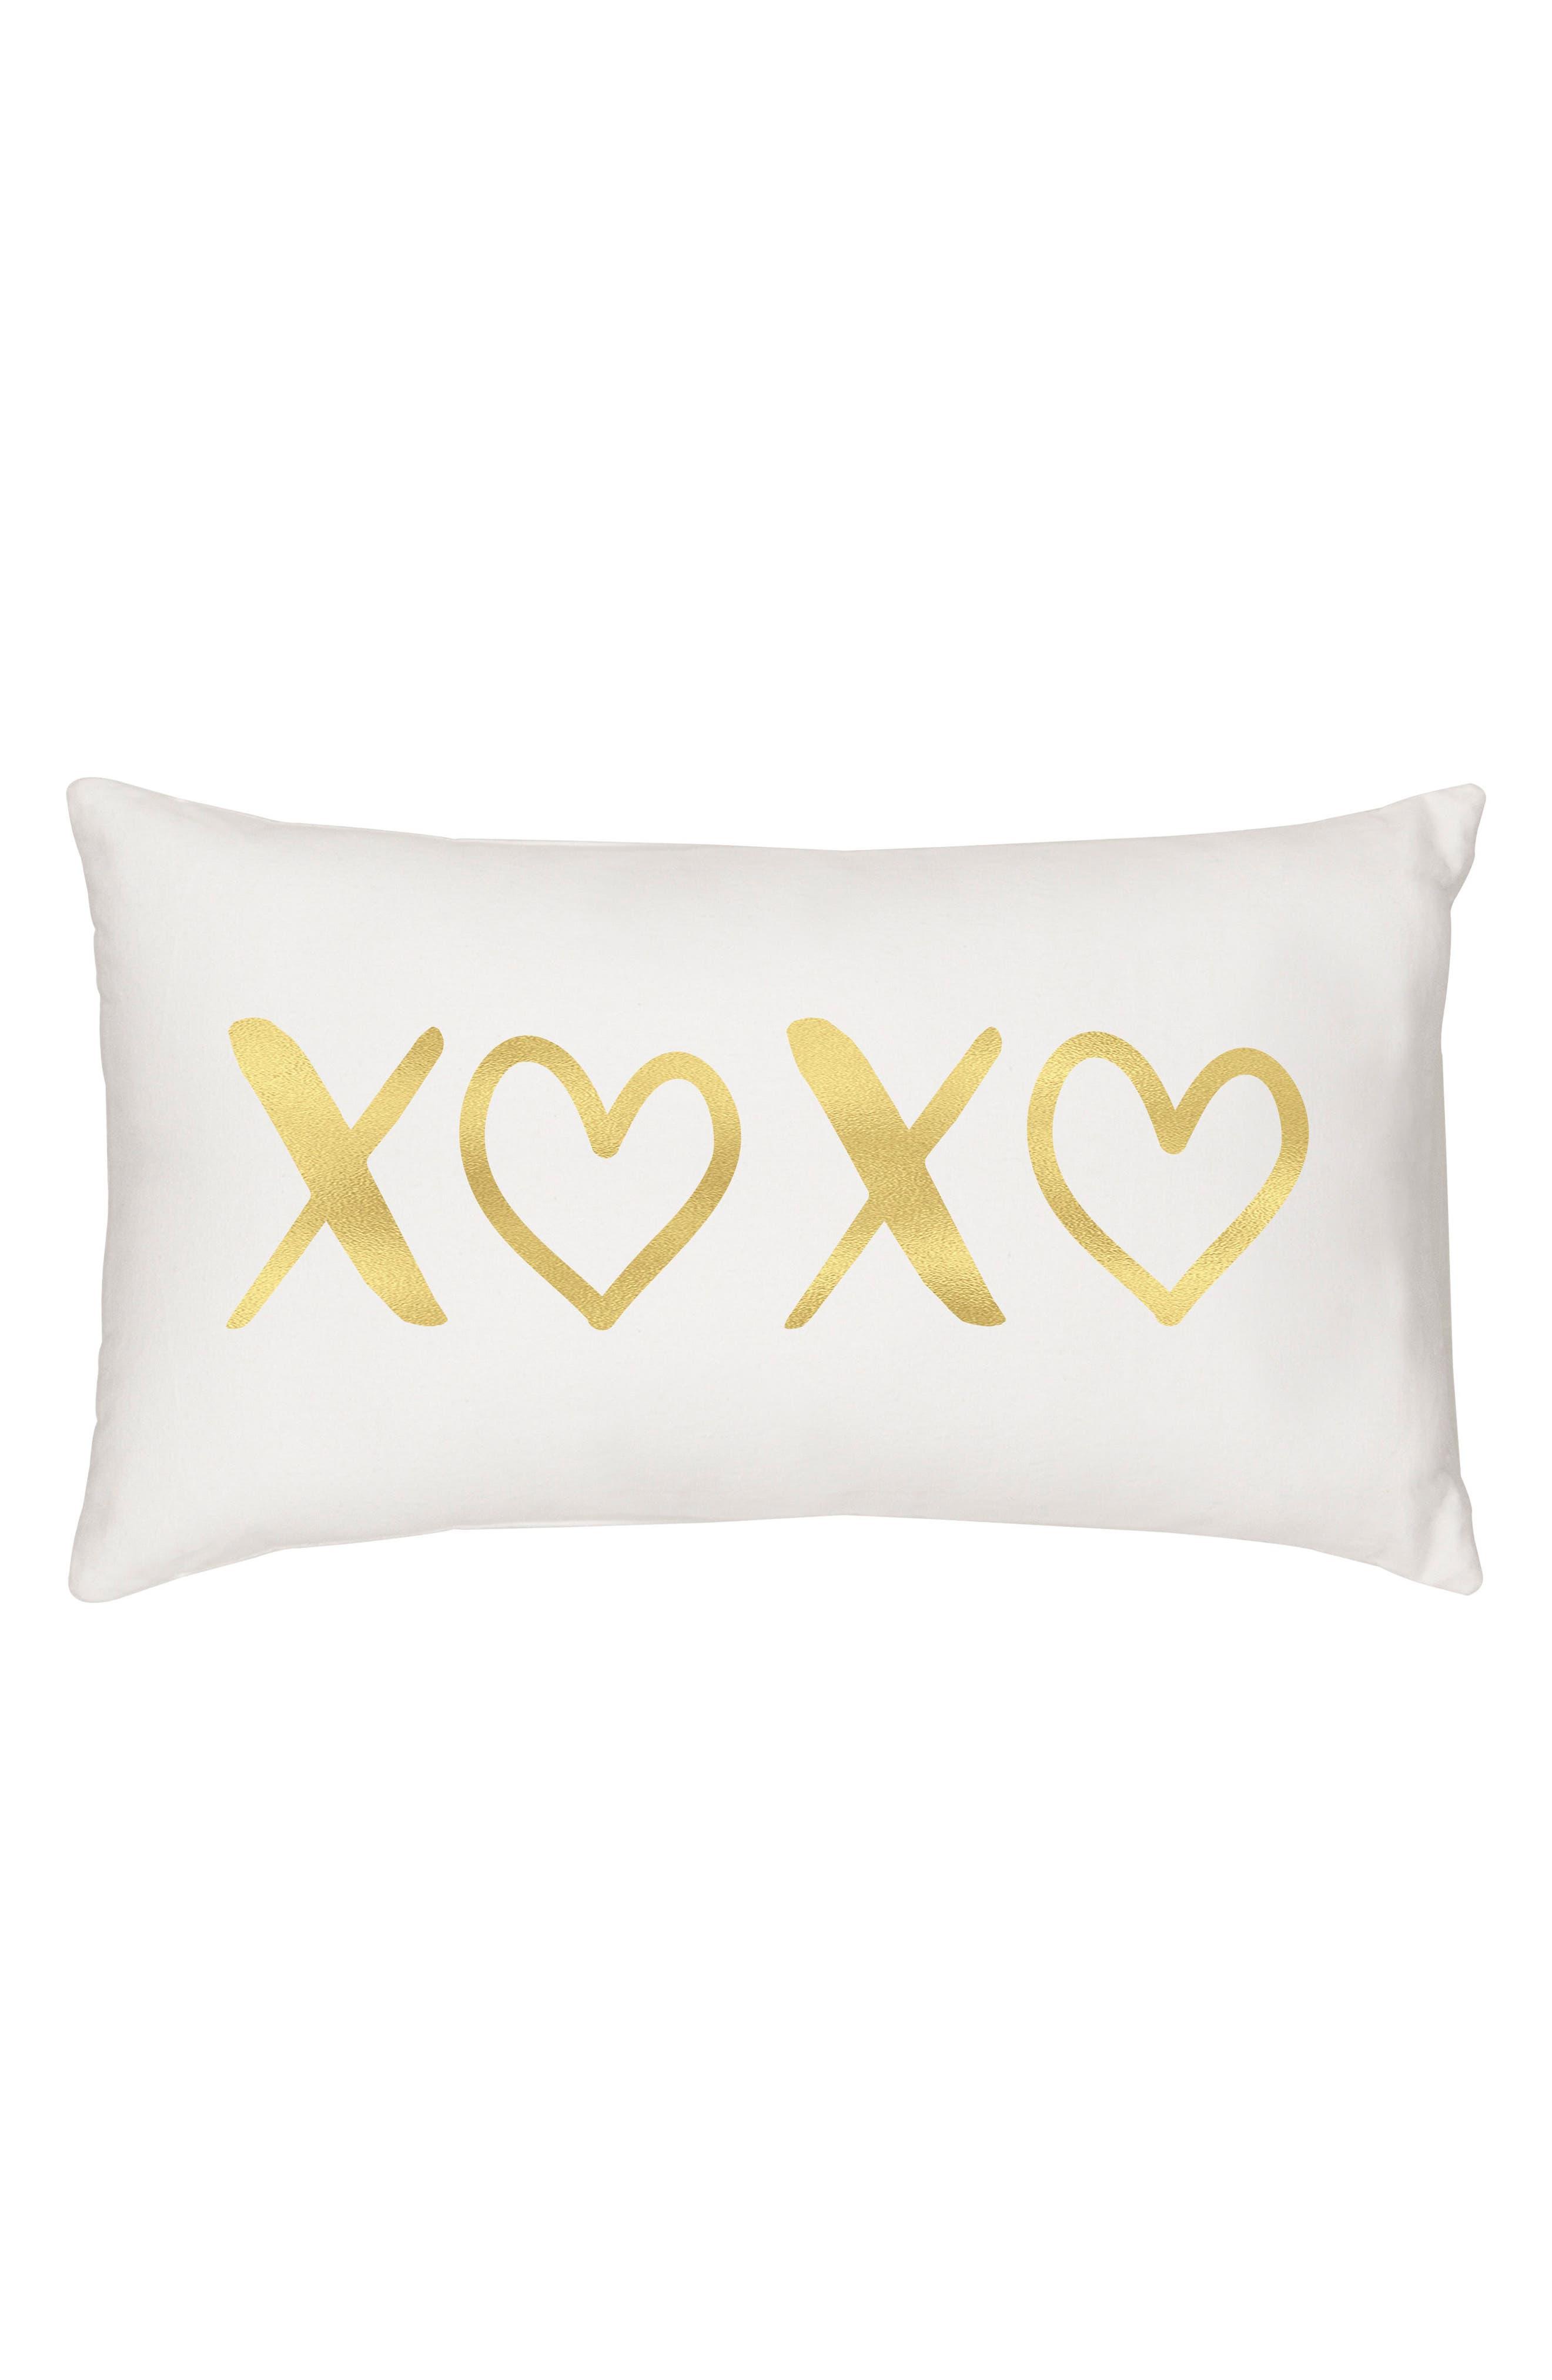 XOXO Accent Pillow,                         Main,                         color, Gold